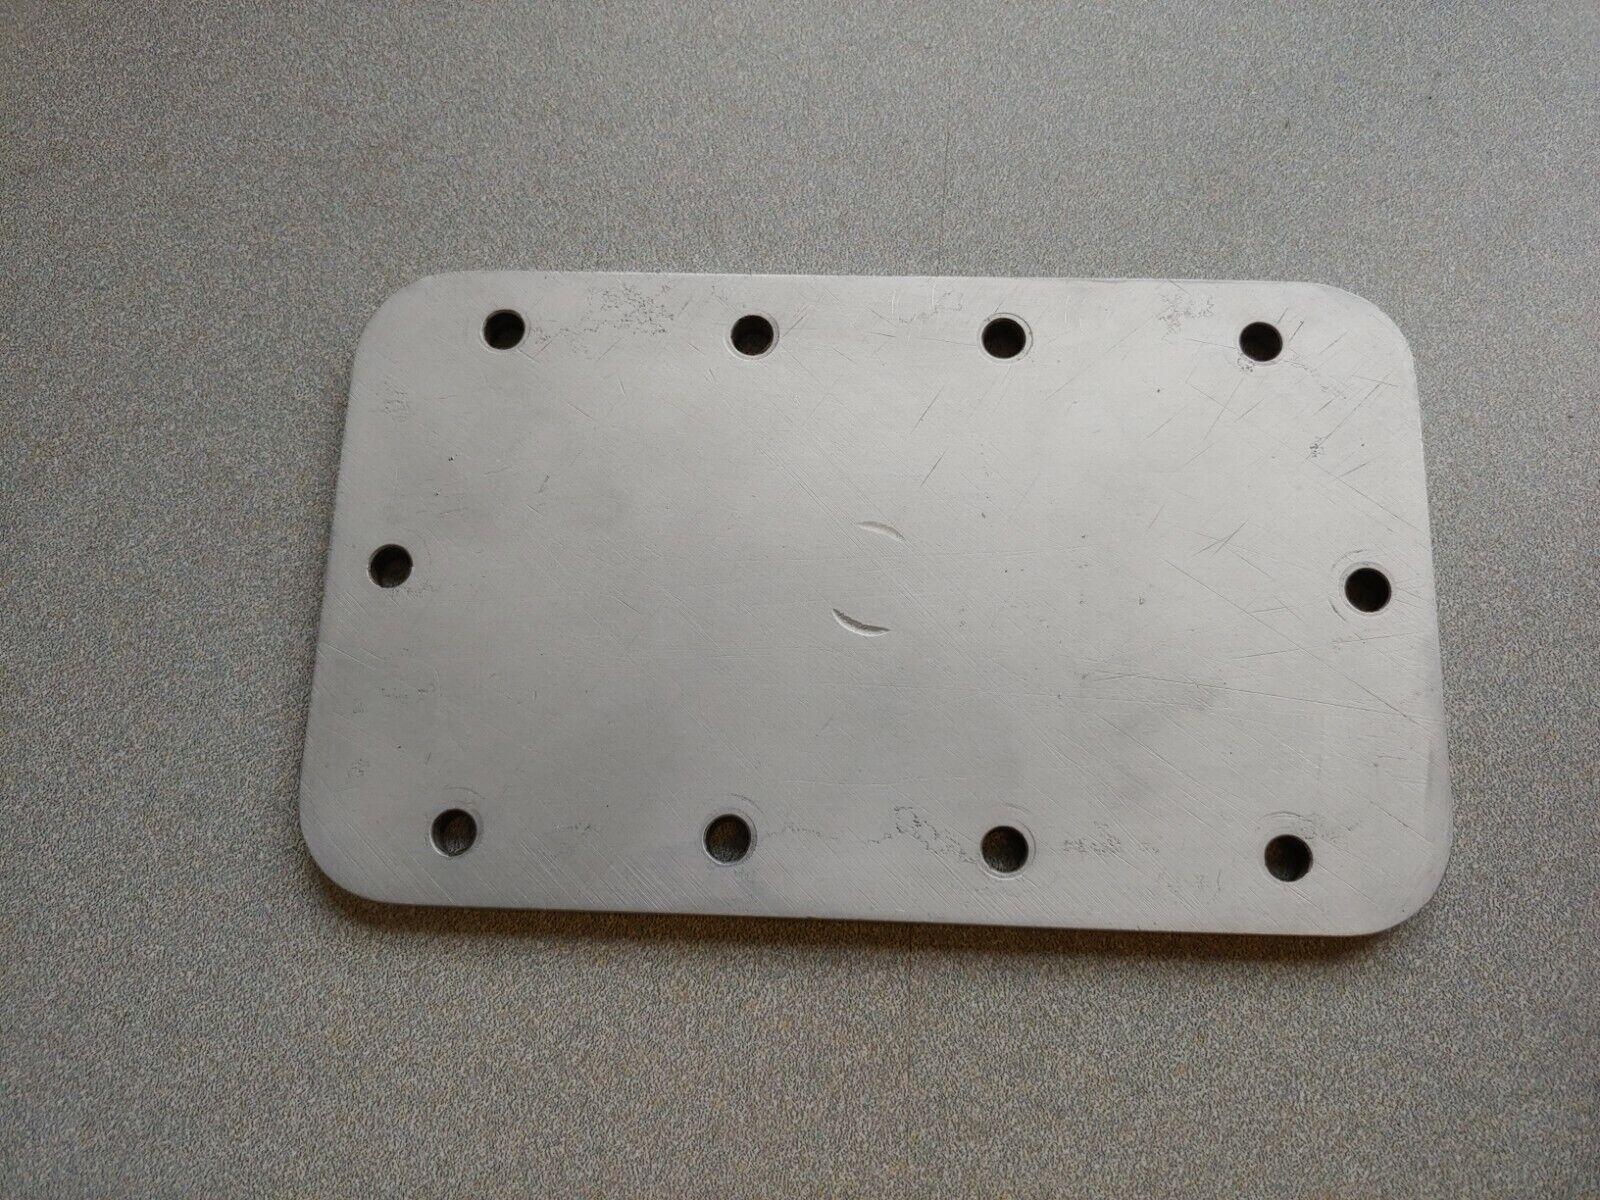 616 101 380 00 OEM 616-101-380-00 Sump Screen Engine Oil Strainer